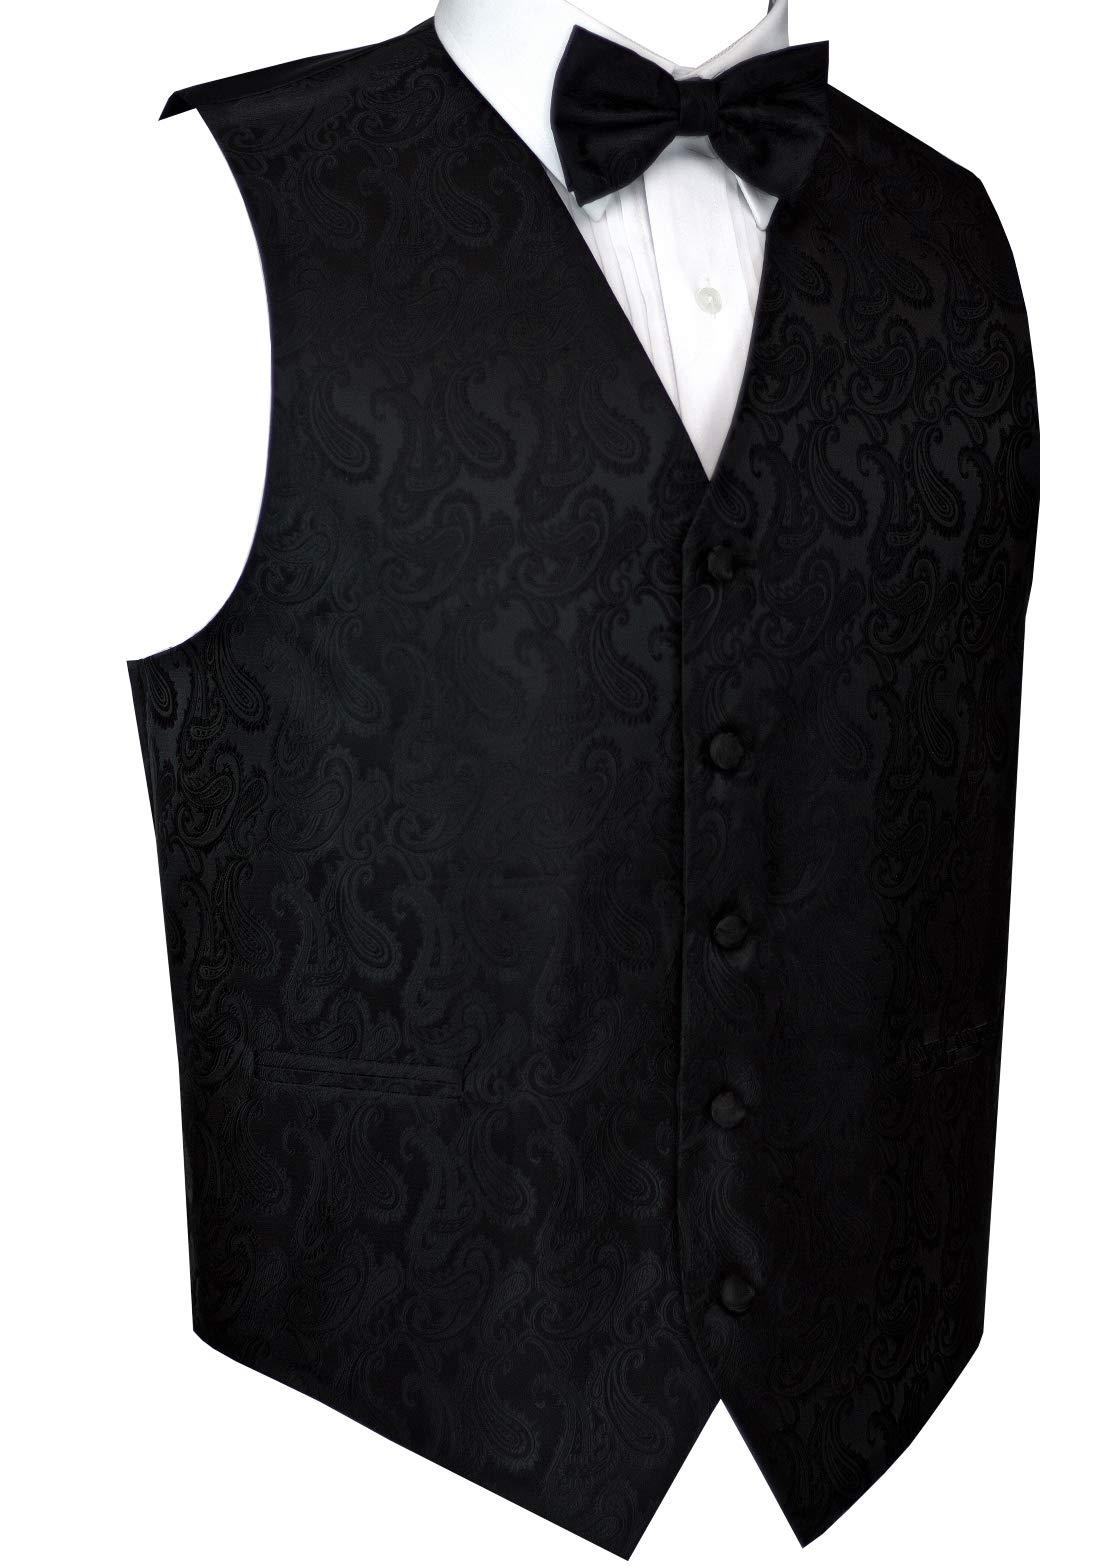 Men's Formal, Prom, Wedding, Tuxedo Vest, Bow-Tie & Hankie Set in Black Paisley - M by Best Tuxedo